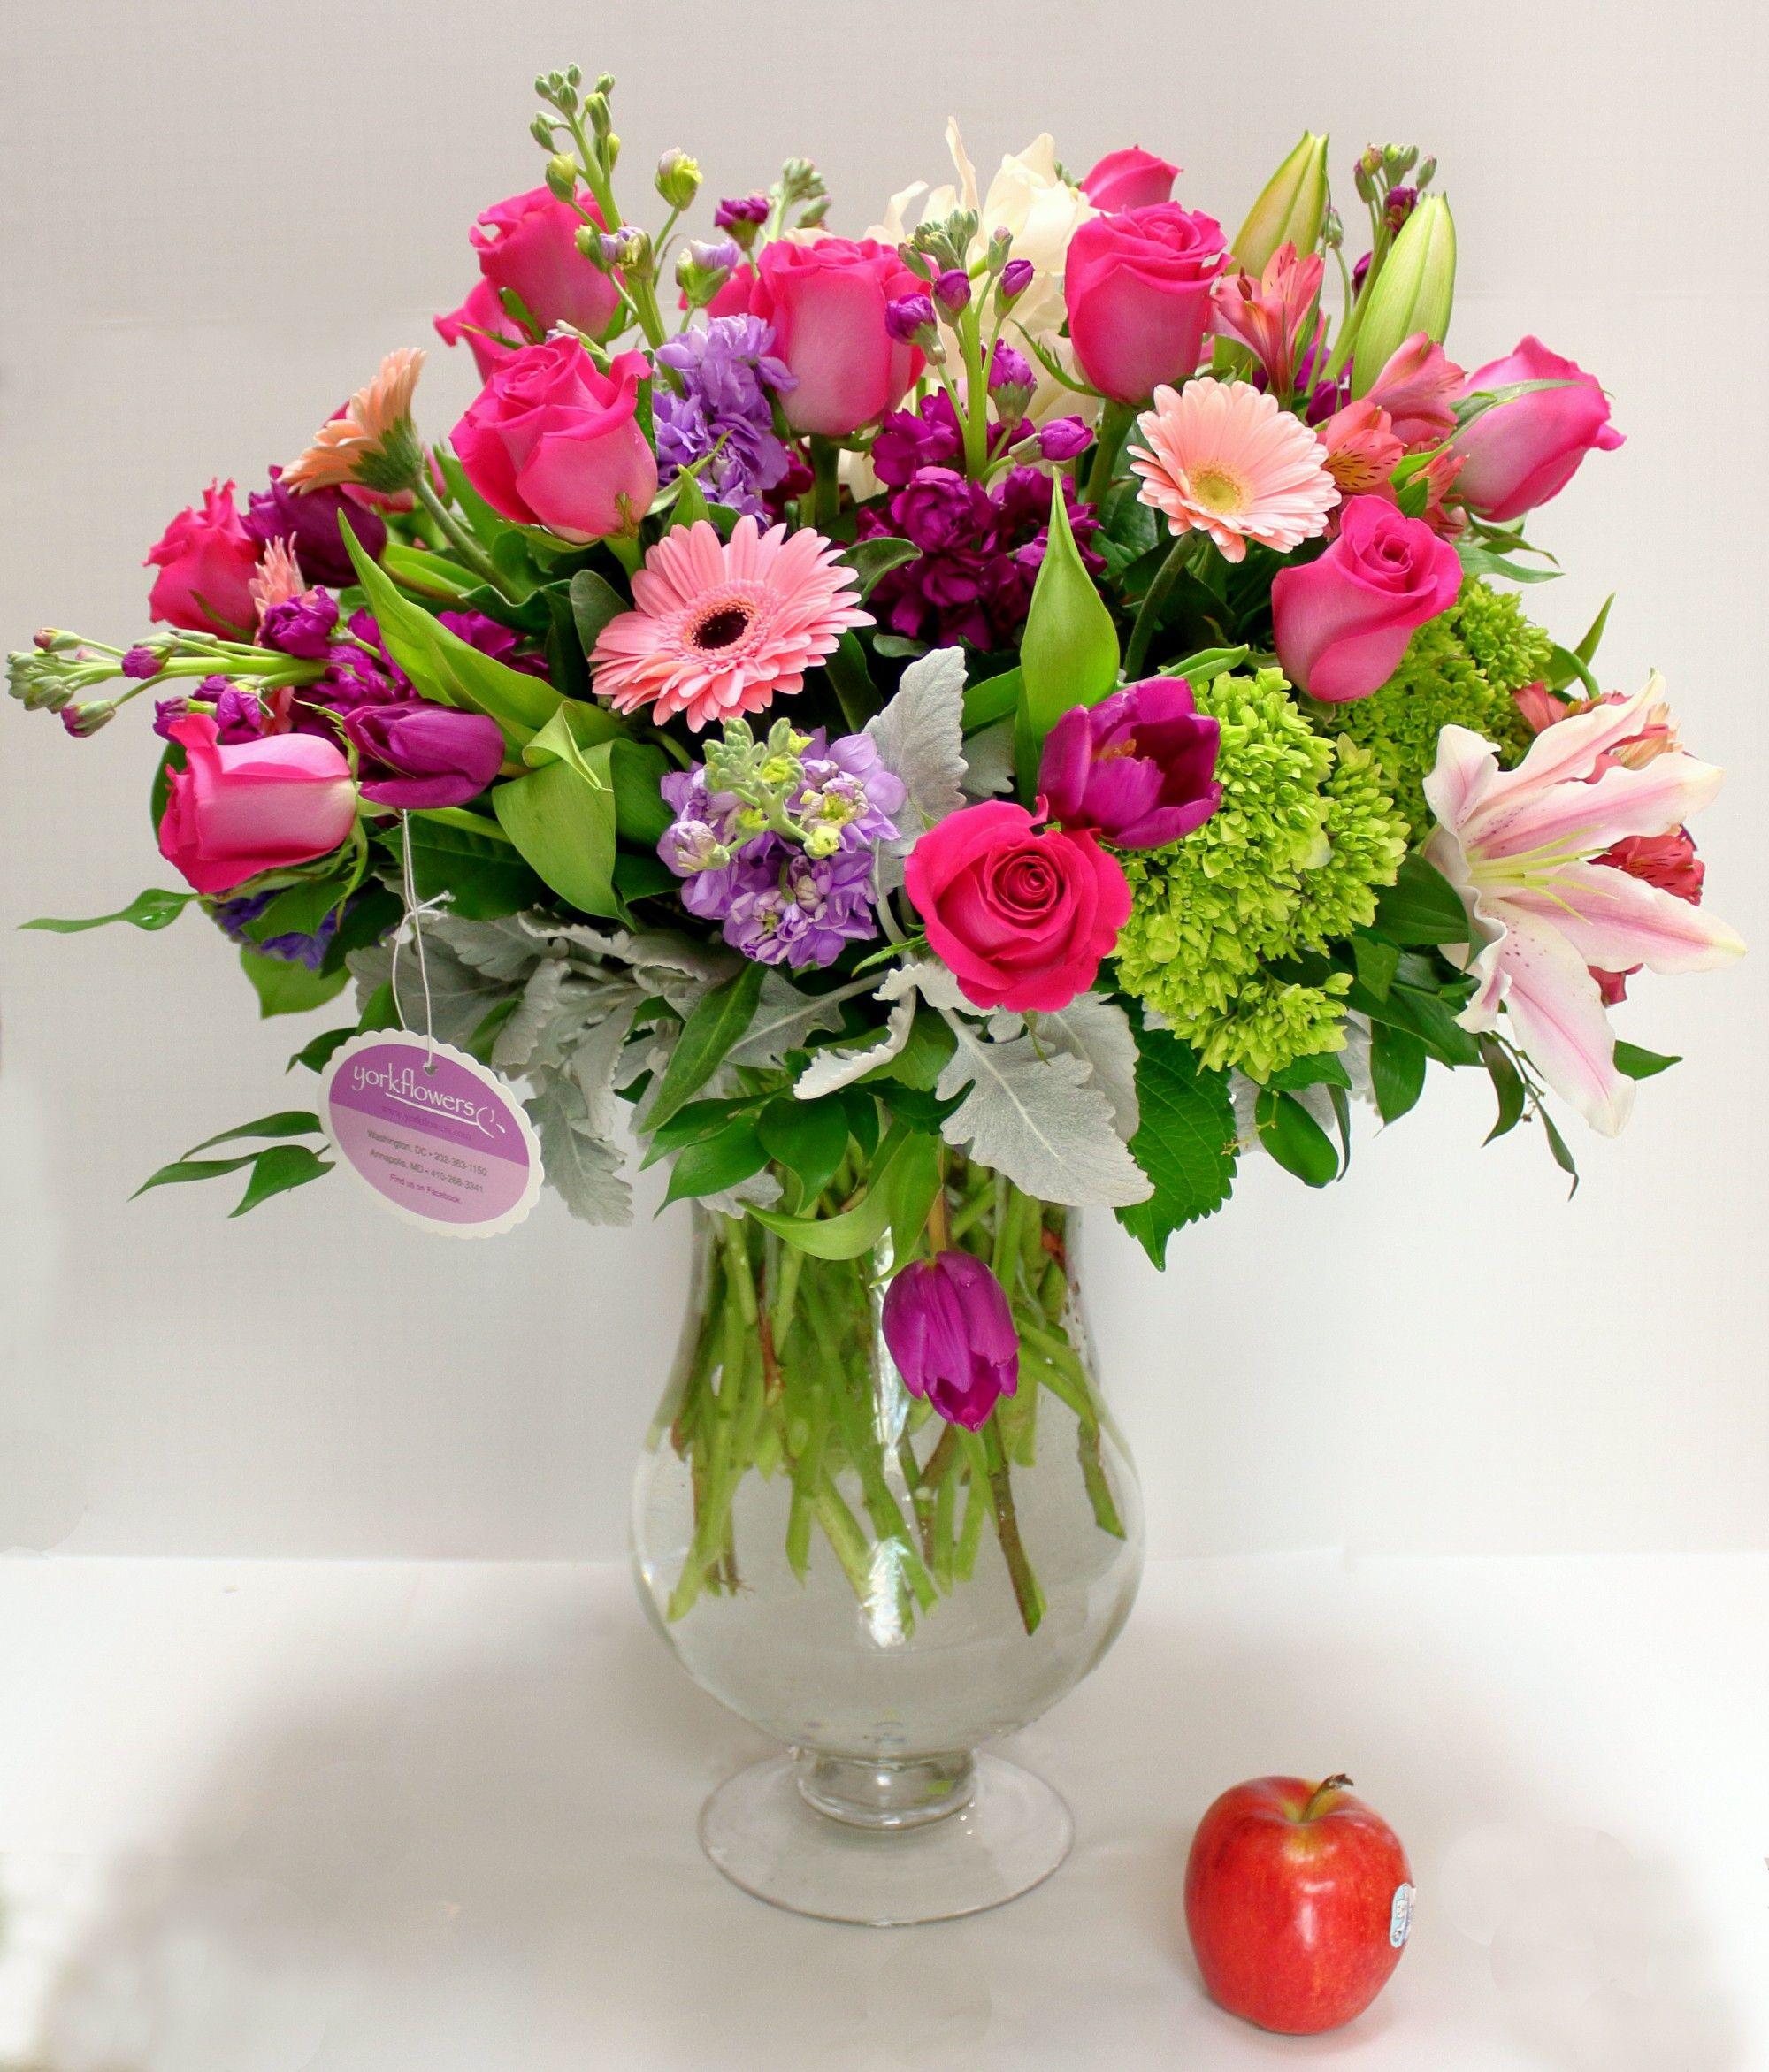 Weddings Florist Washington Dc: Send Dazzling Bouquet In Washington, DC From York Flowers